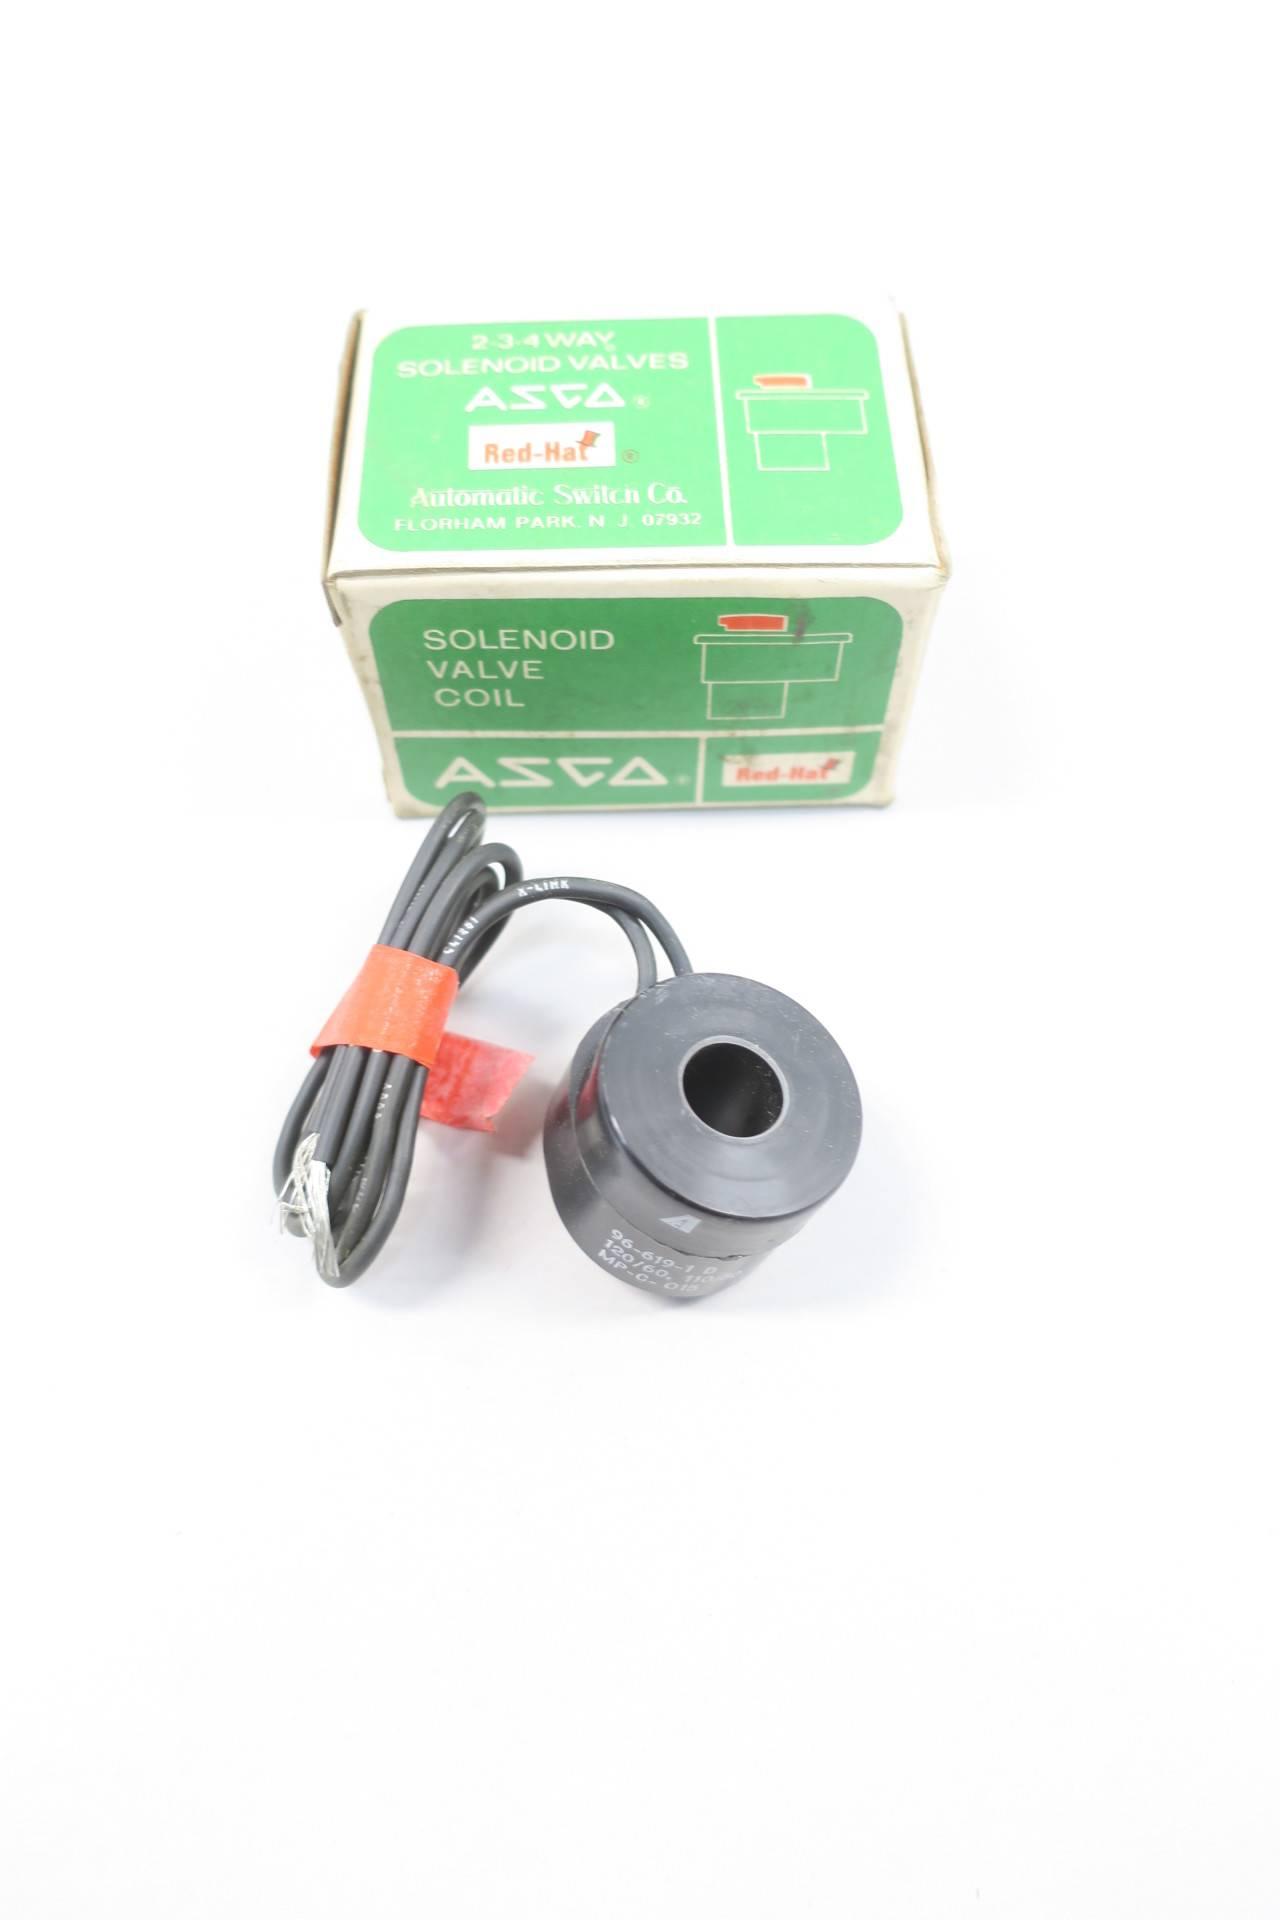 Asco 96-619-1-D Red-hat Solenoid Valve Coil 120v-ac